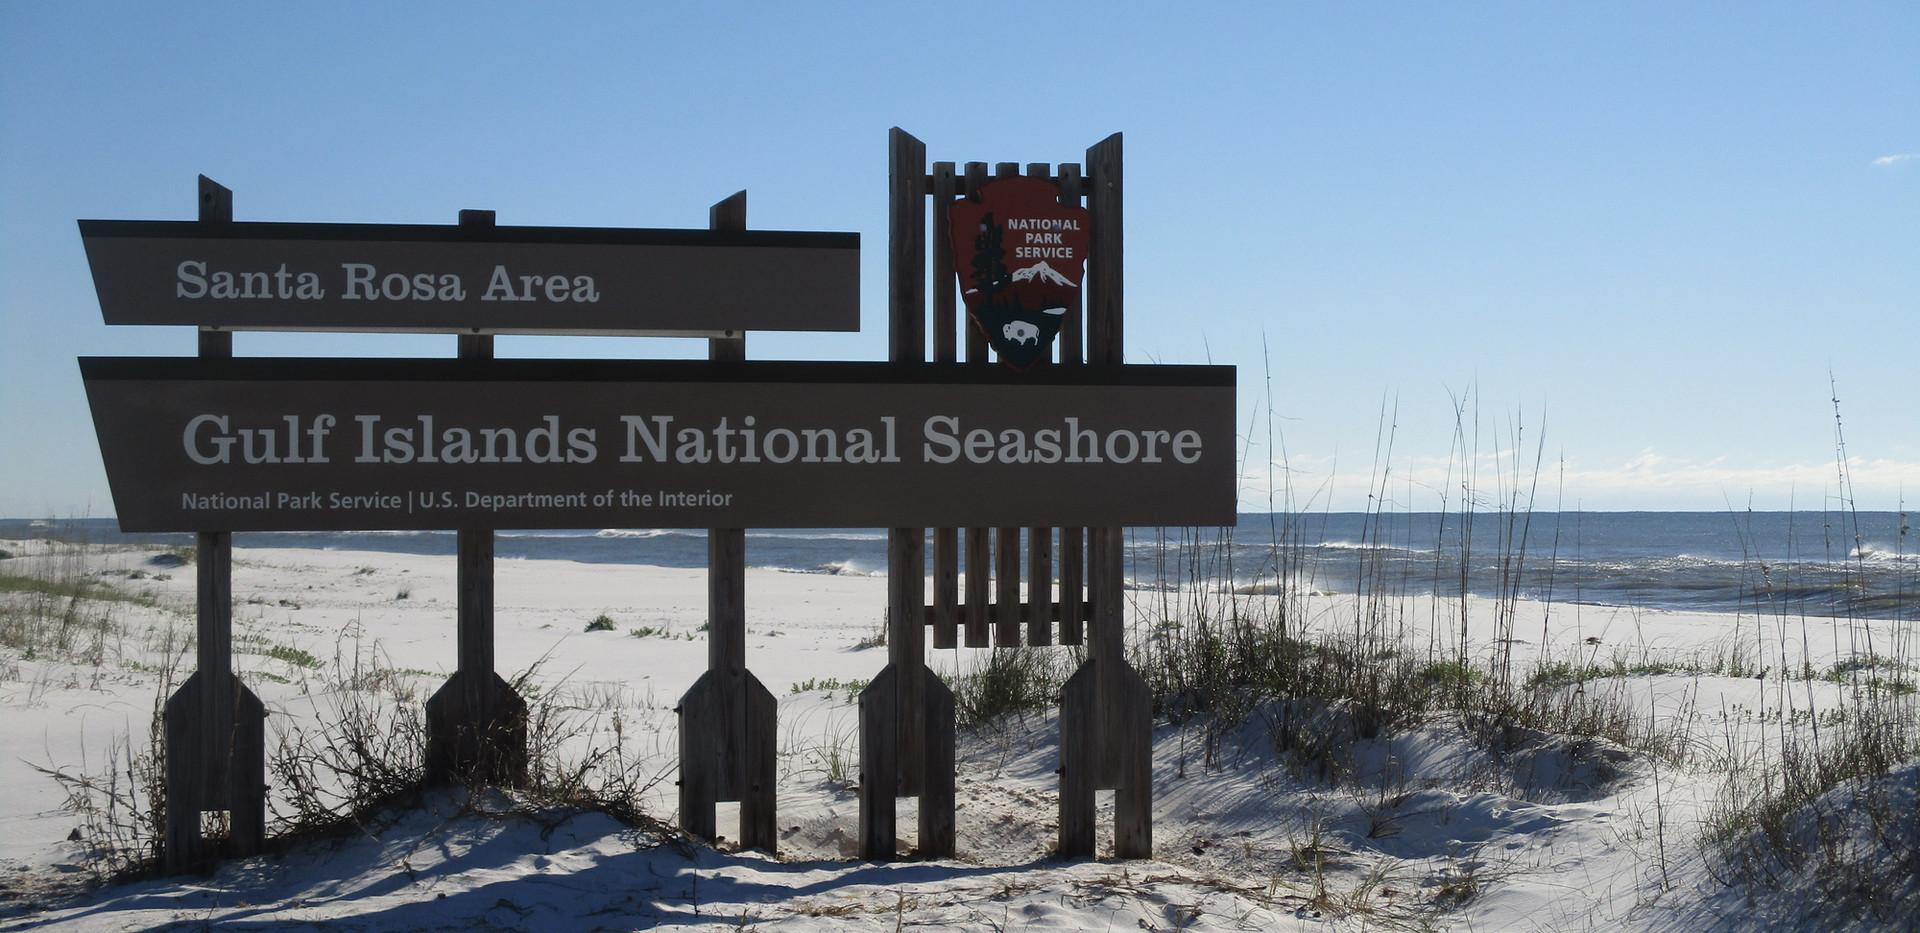 Beautiful view along national seashore